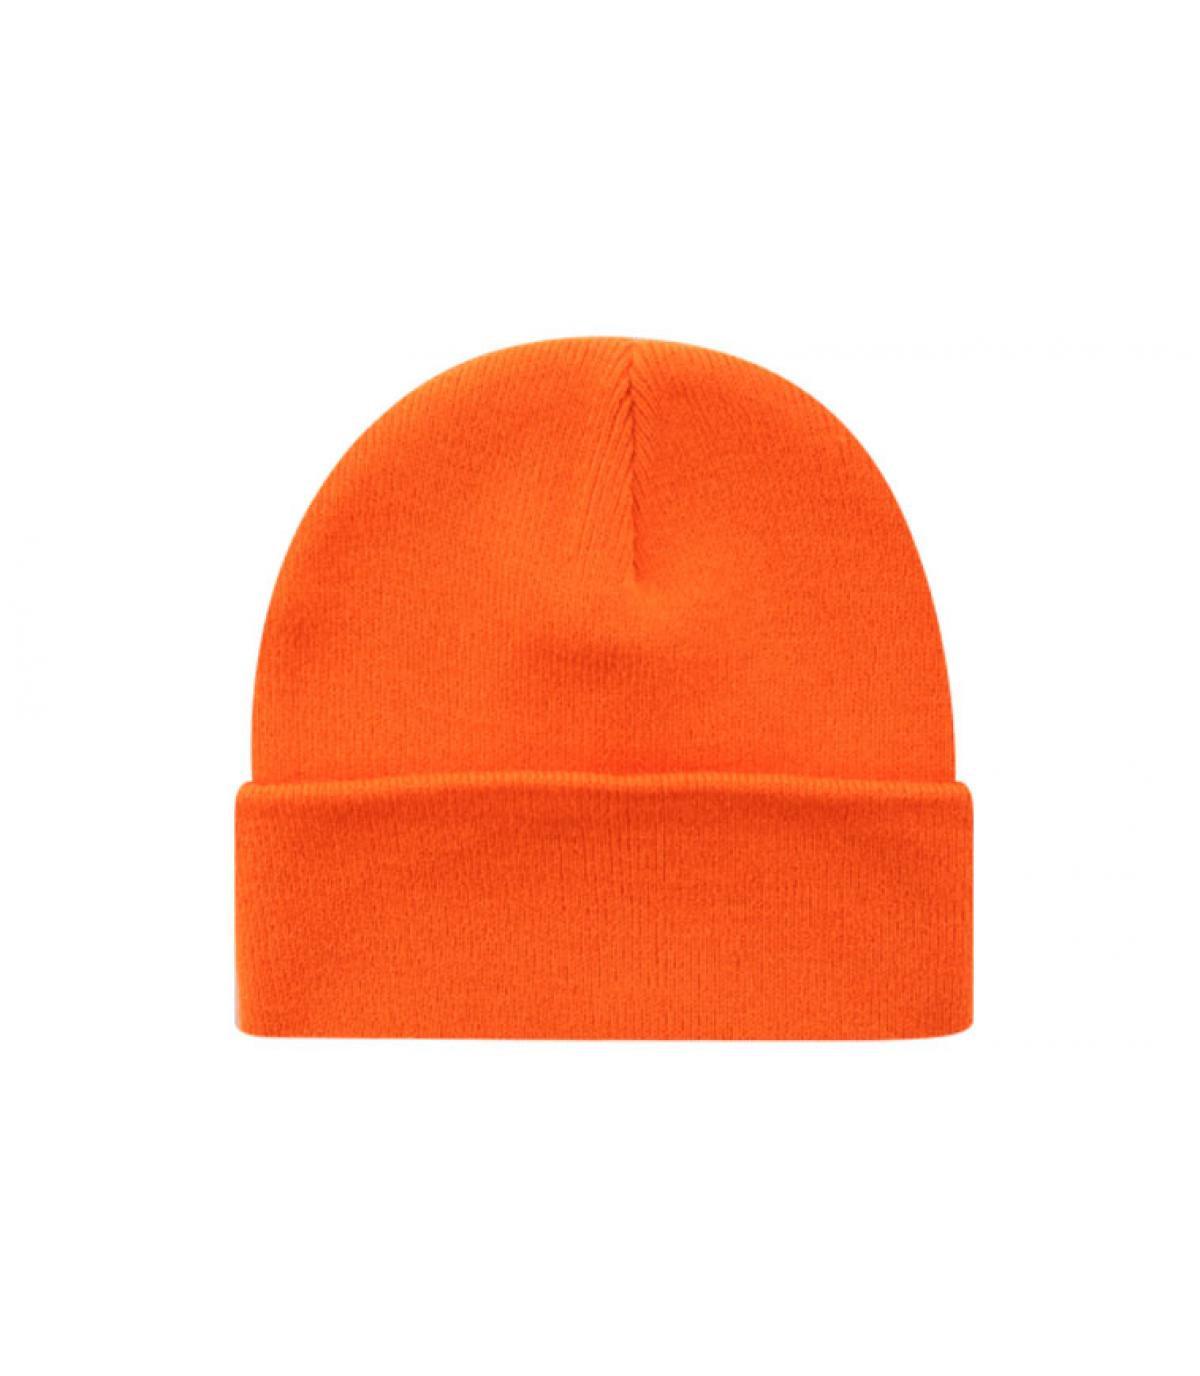 Beanie blank orange